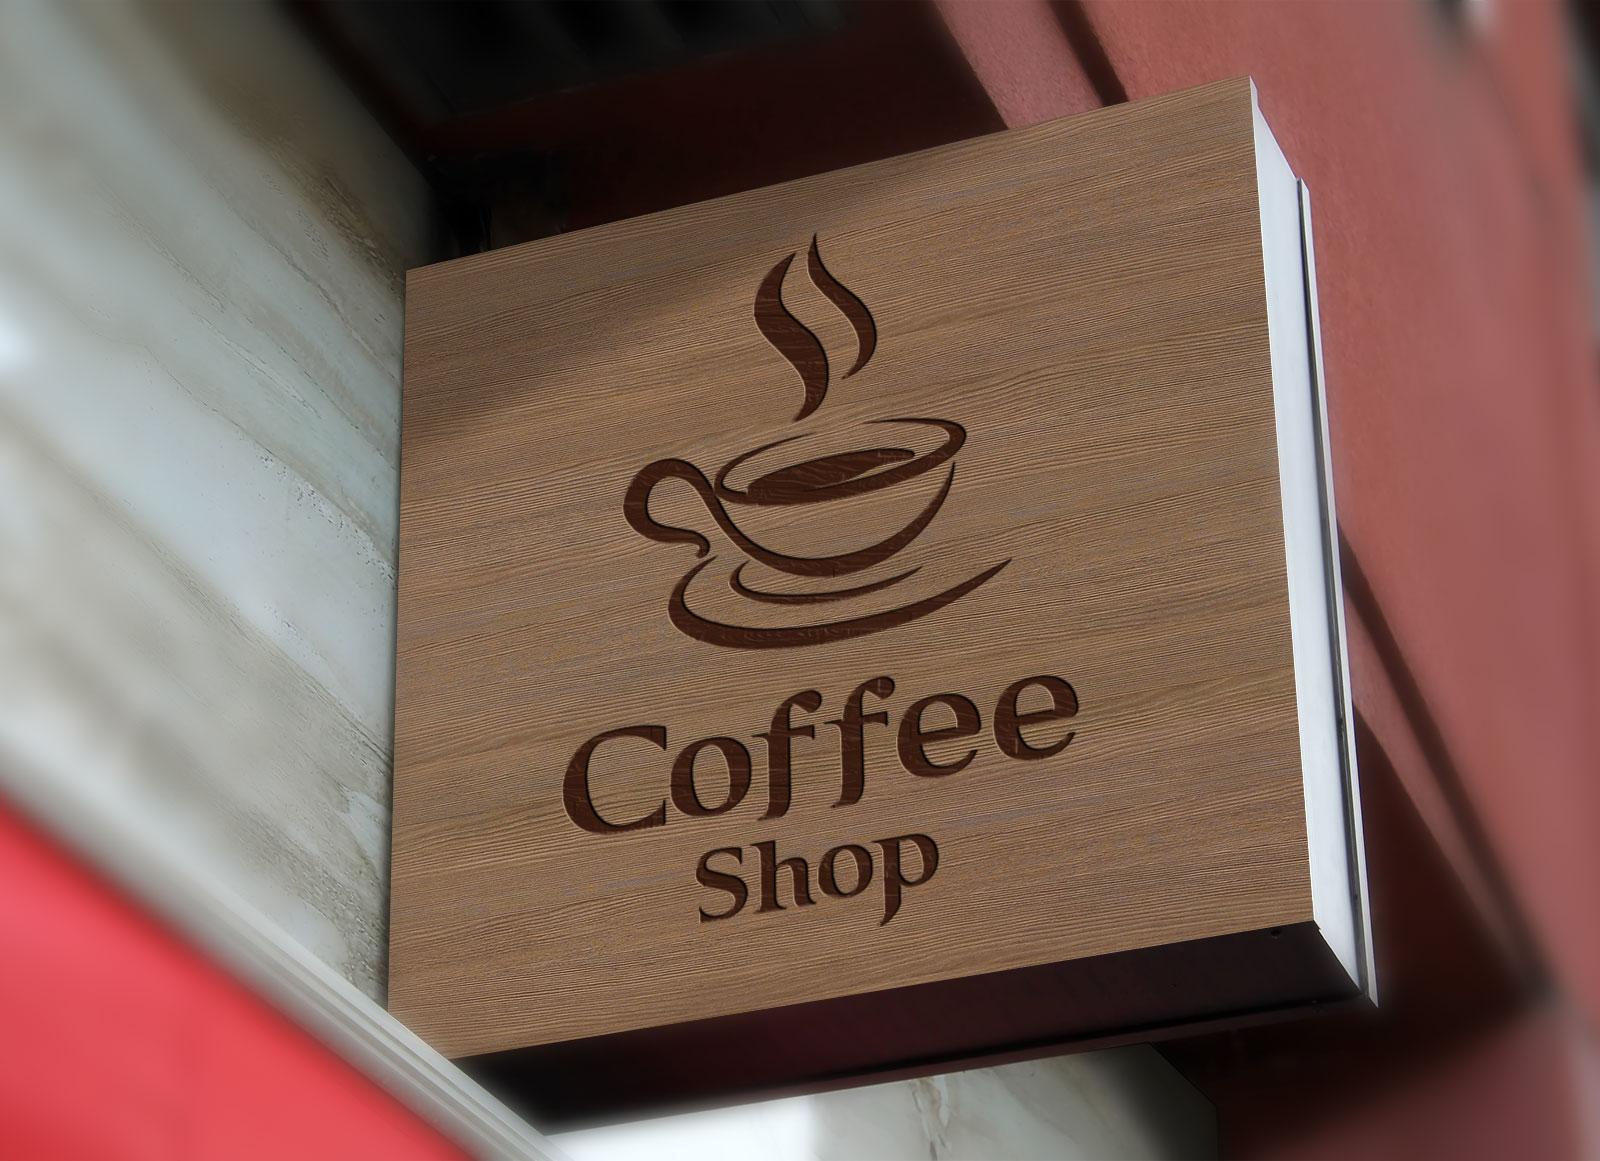 Free-Wall-Mounted-Coffee-Shop-Sign-Board-Mockup-PSD